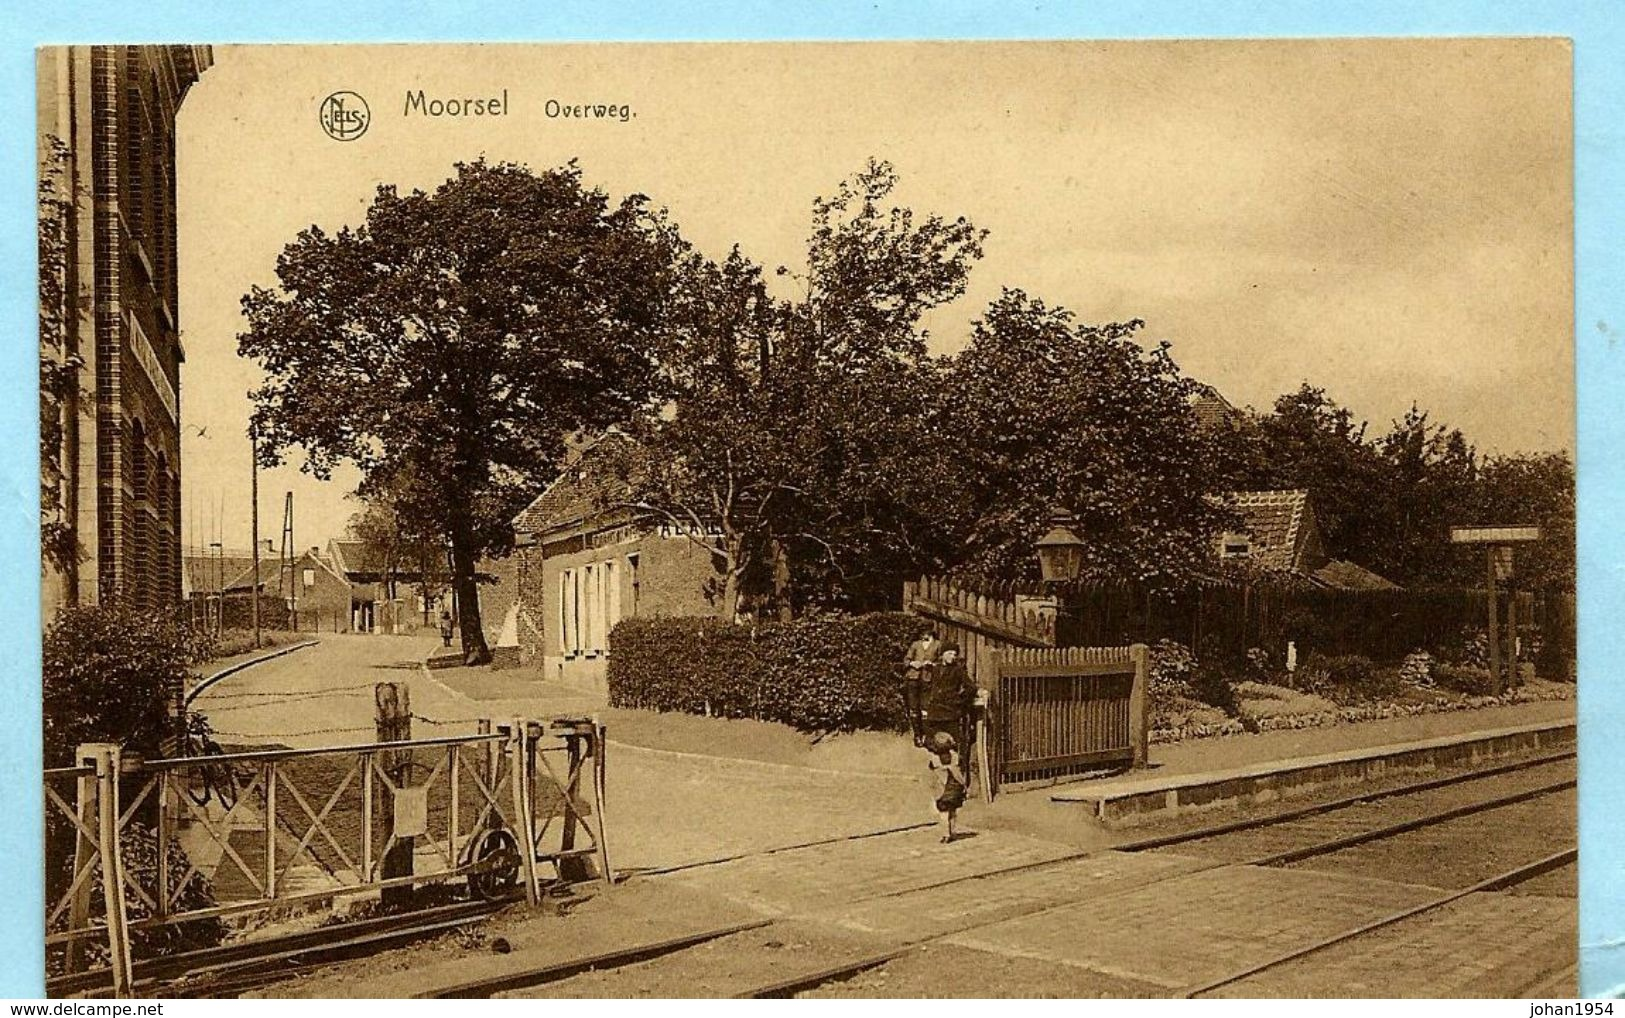 MOORSEL - Overweg - Aalst